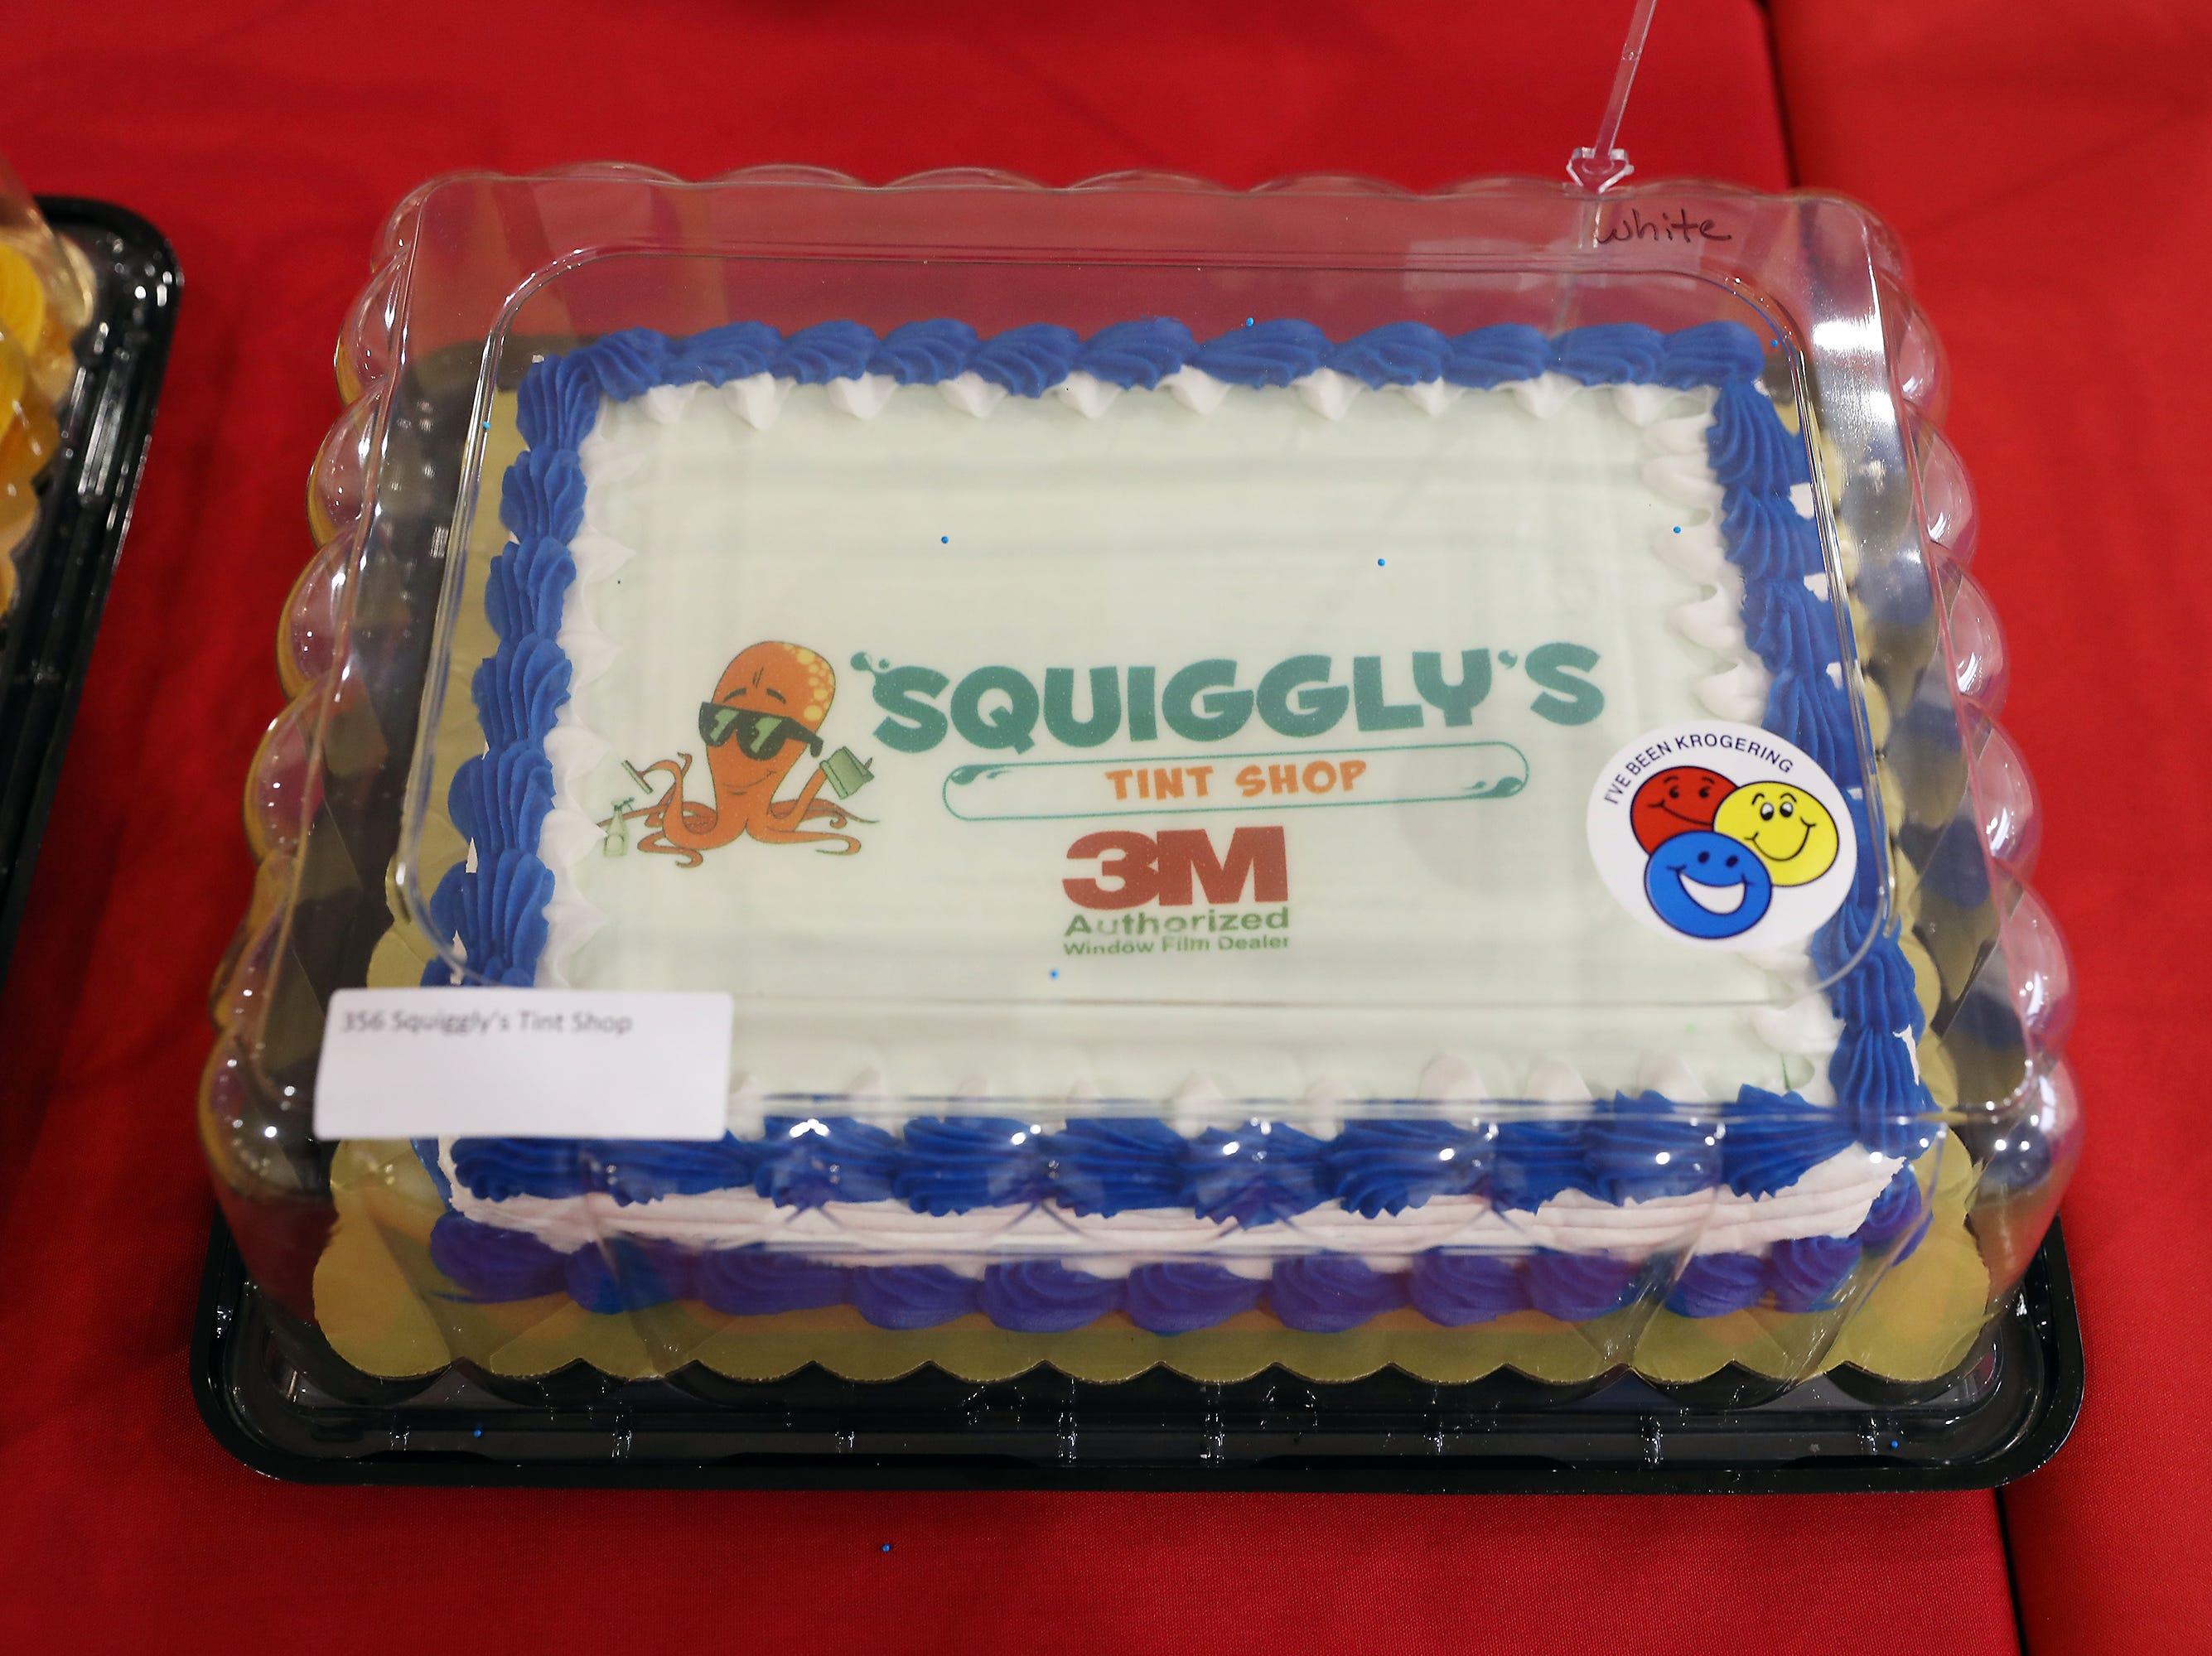 3:15 P.M. Friday cake 356 Squiggly's Tint Shop - 3M FX premium tint; $245